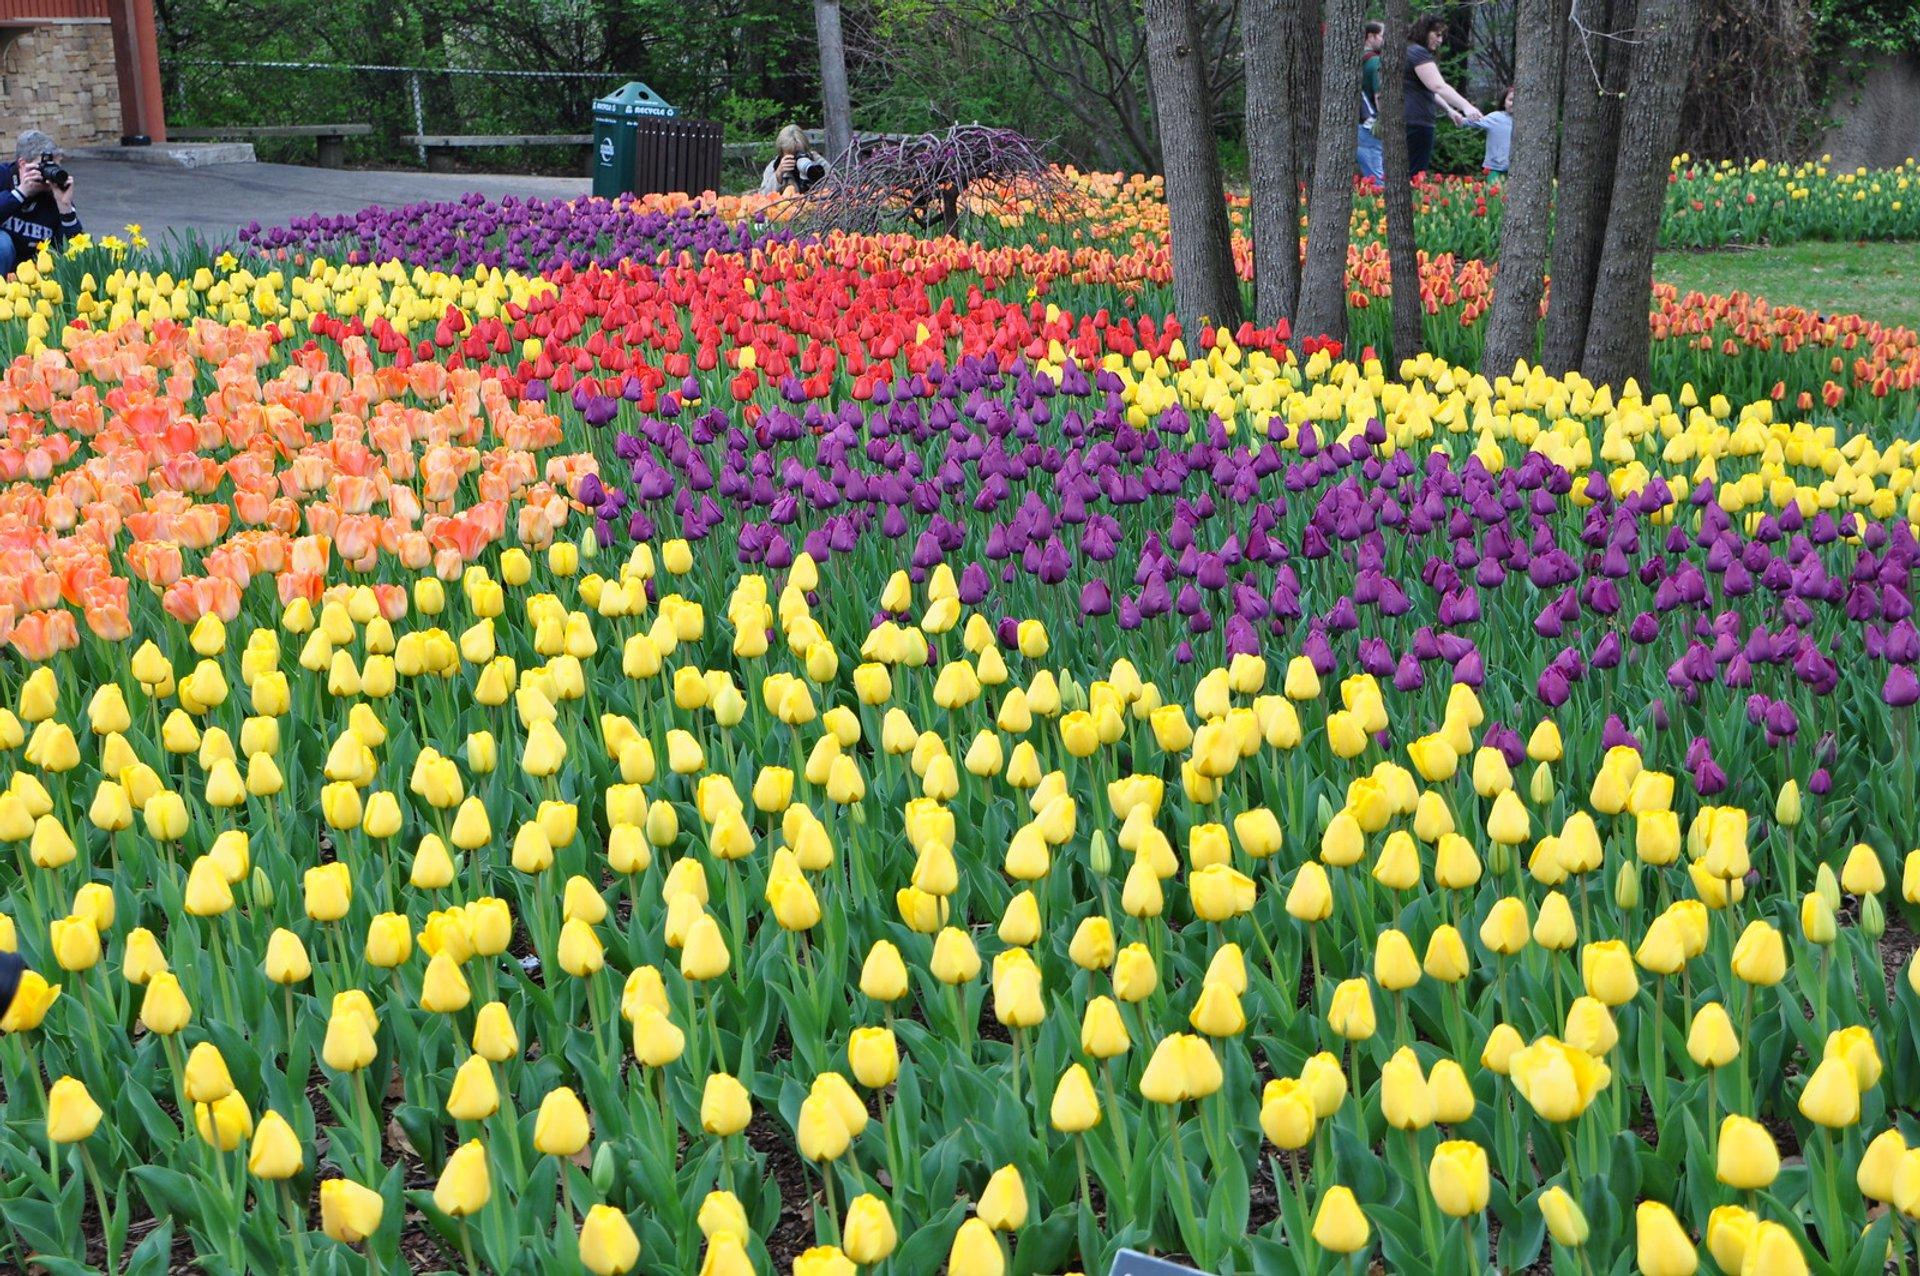 Tulips at Cincinnati Zoo & Botanical Gardens 2020